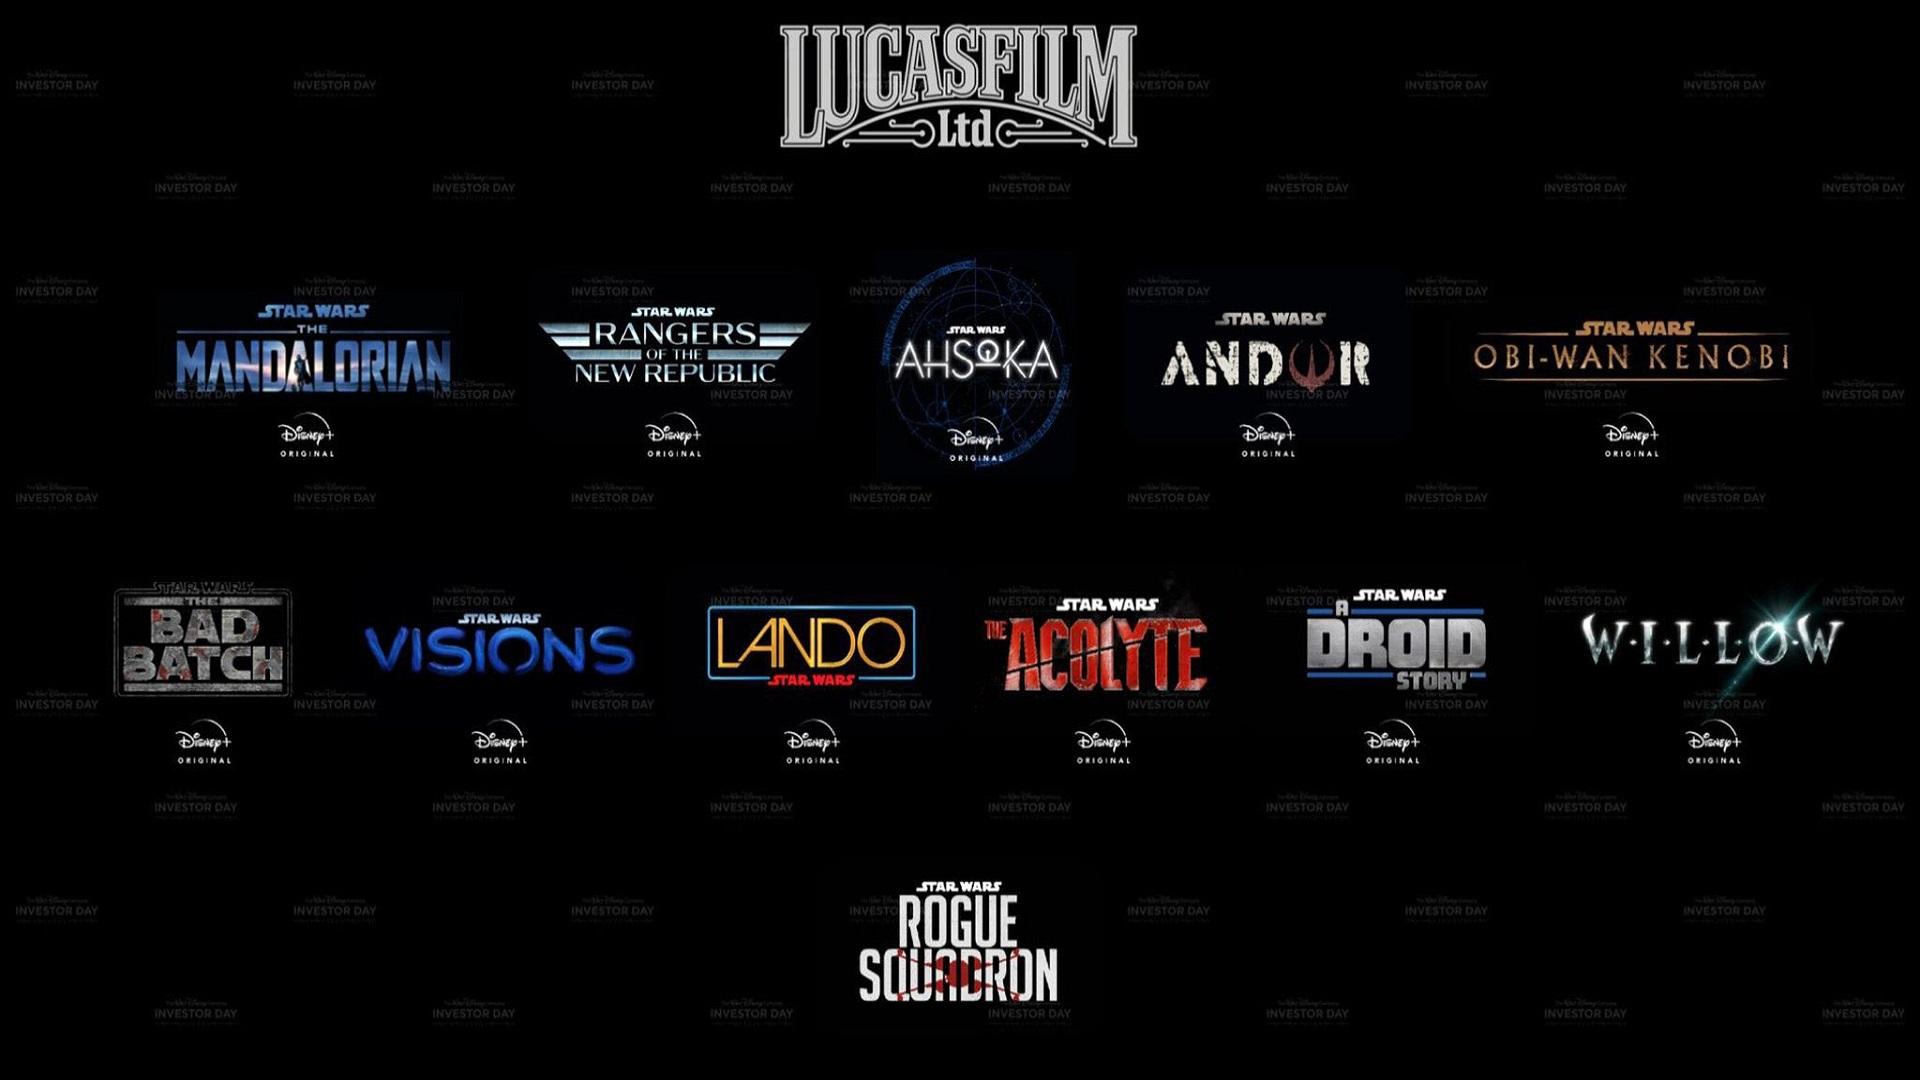 Star Wars: Rogue Squadron, Kenobi, Ahsoka ... what to remember from Disney Investor Day 2020